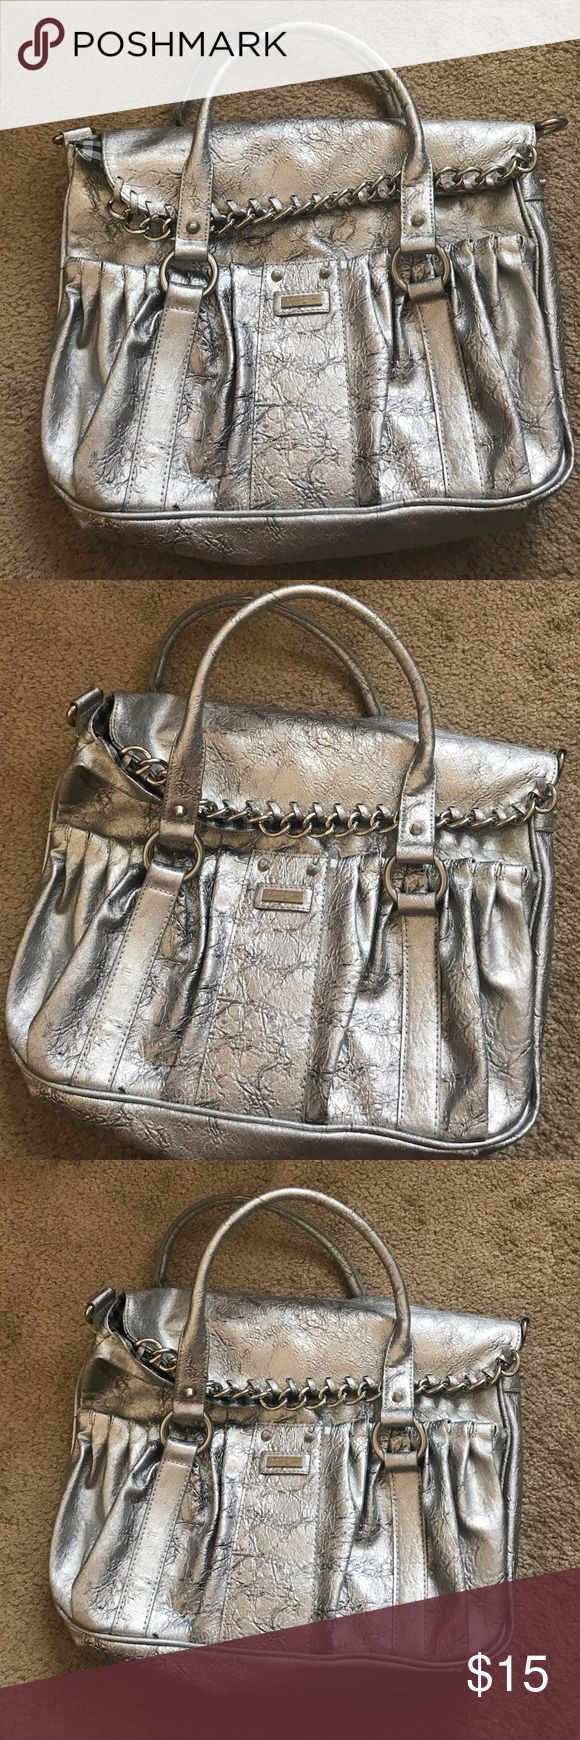 Jessica Simpson Purse Beautiful Silver Jessica Simpson purse. In perfect rarely used condition. Jessica Simpson Bags